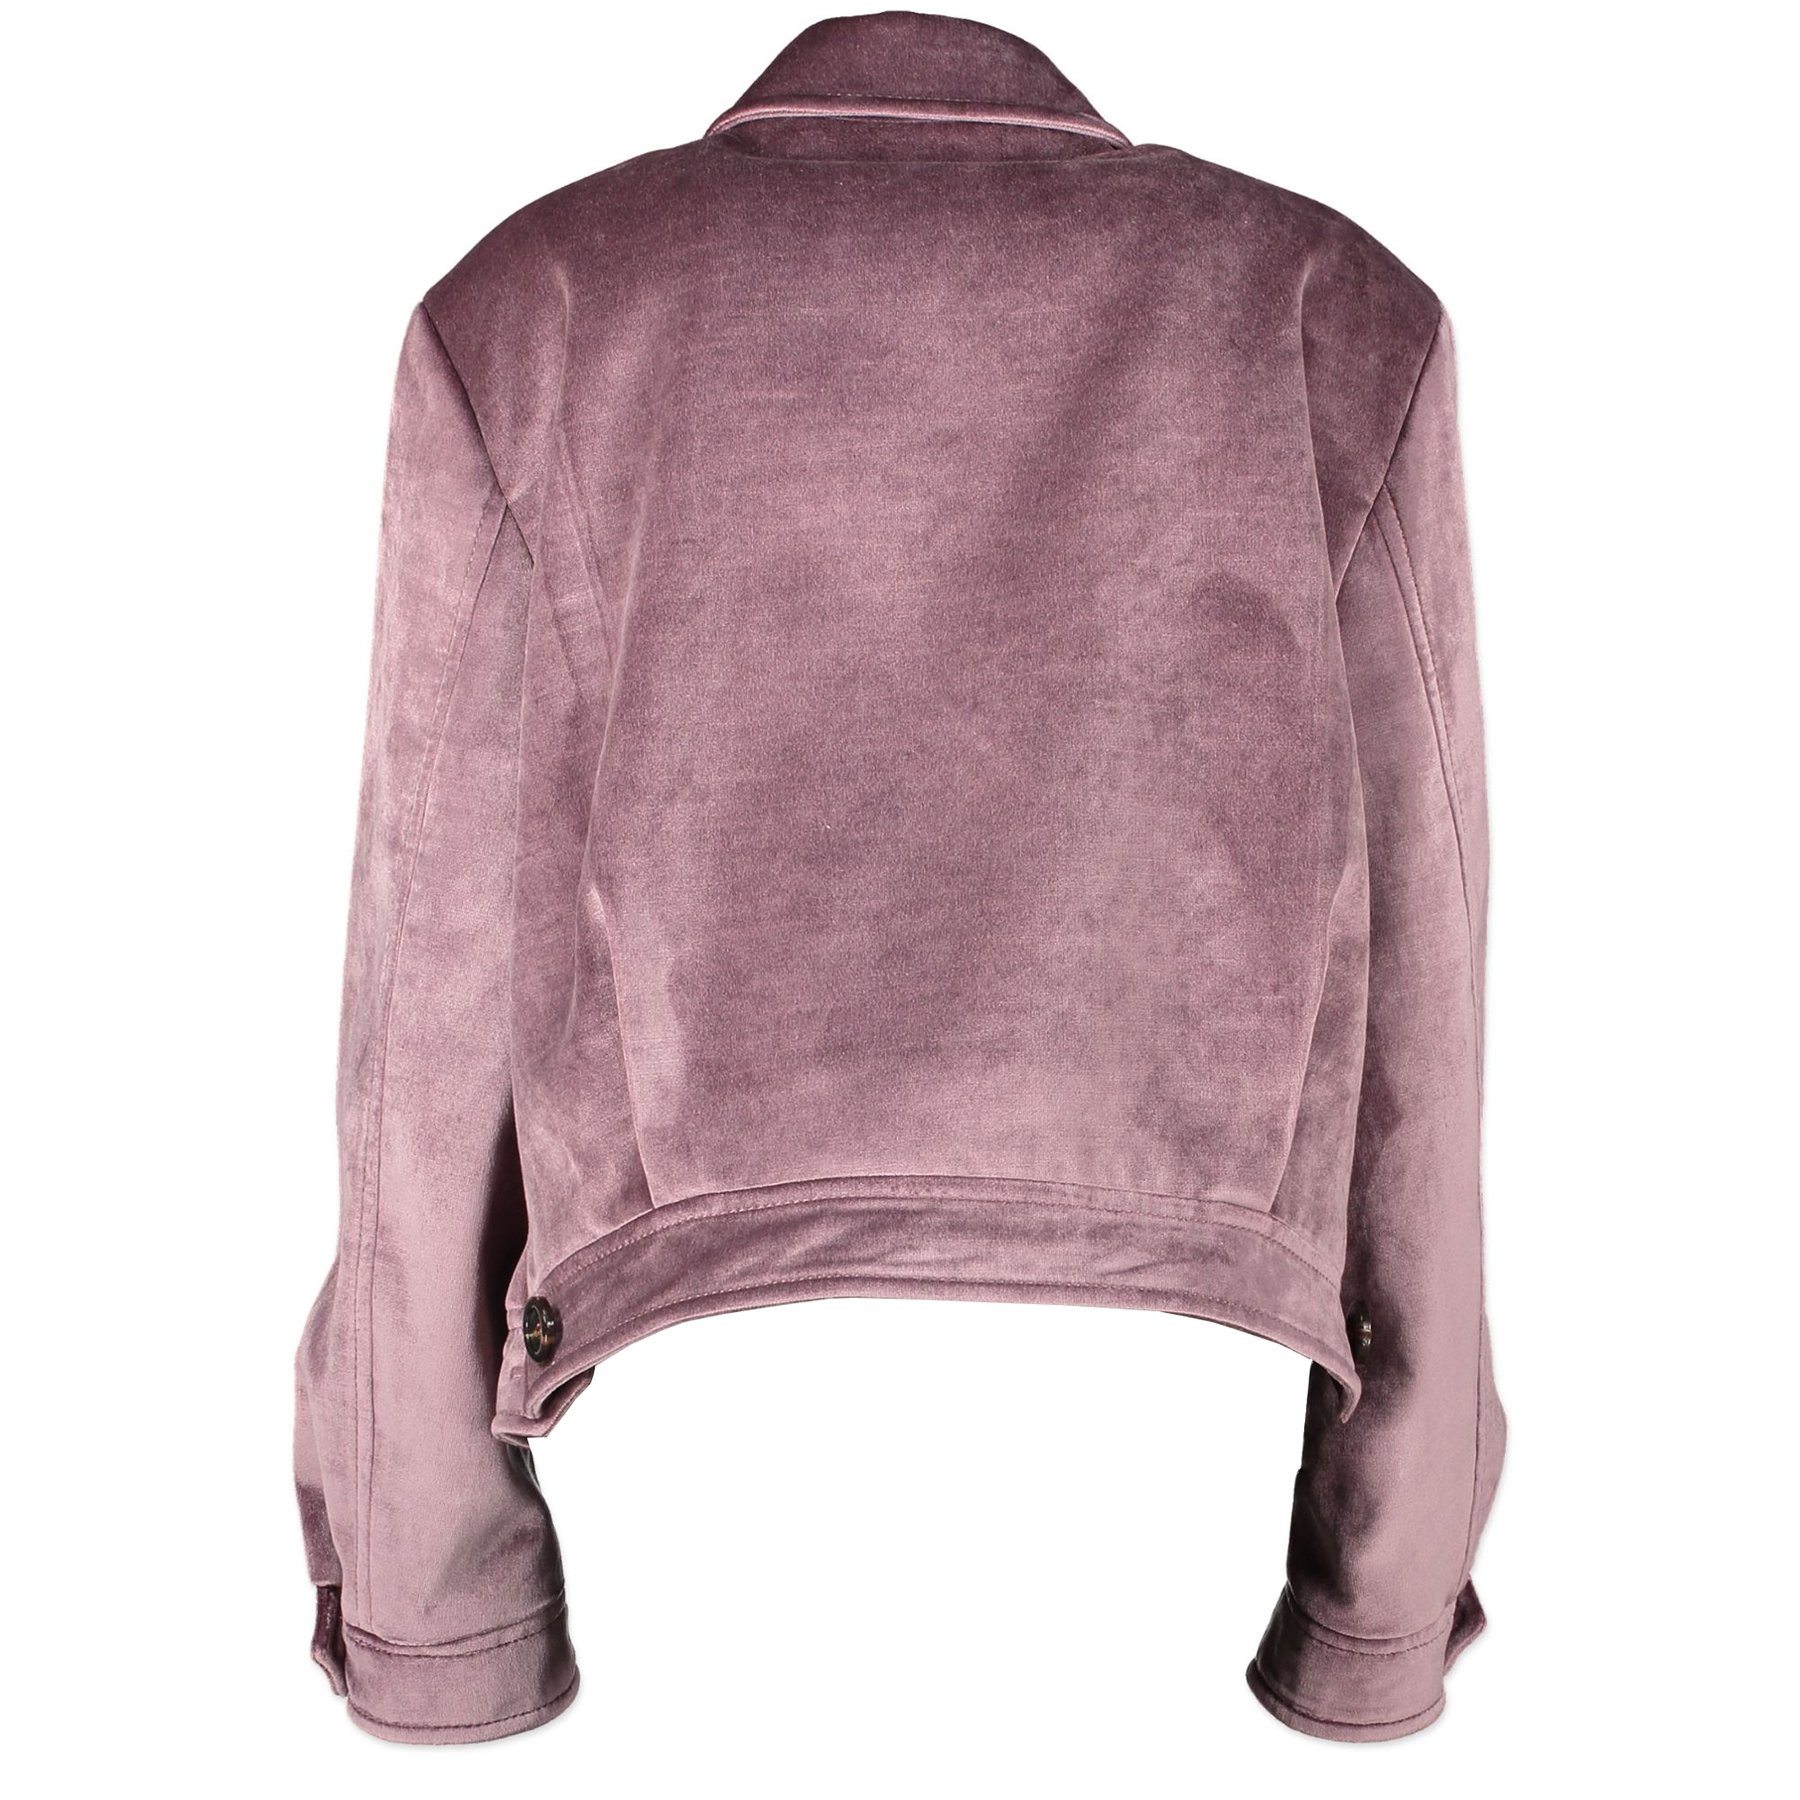 Authentic secondhand Miu Miu Purple Velvet Beaded Appliqué Jacket - Size IT46 designer clothing designer brands fashion luxury vintage webshop safe secure online shopping